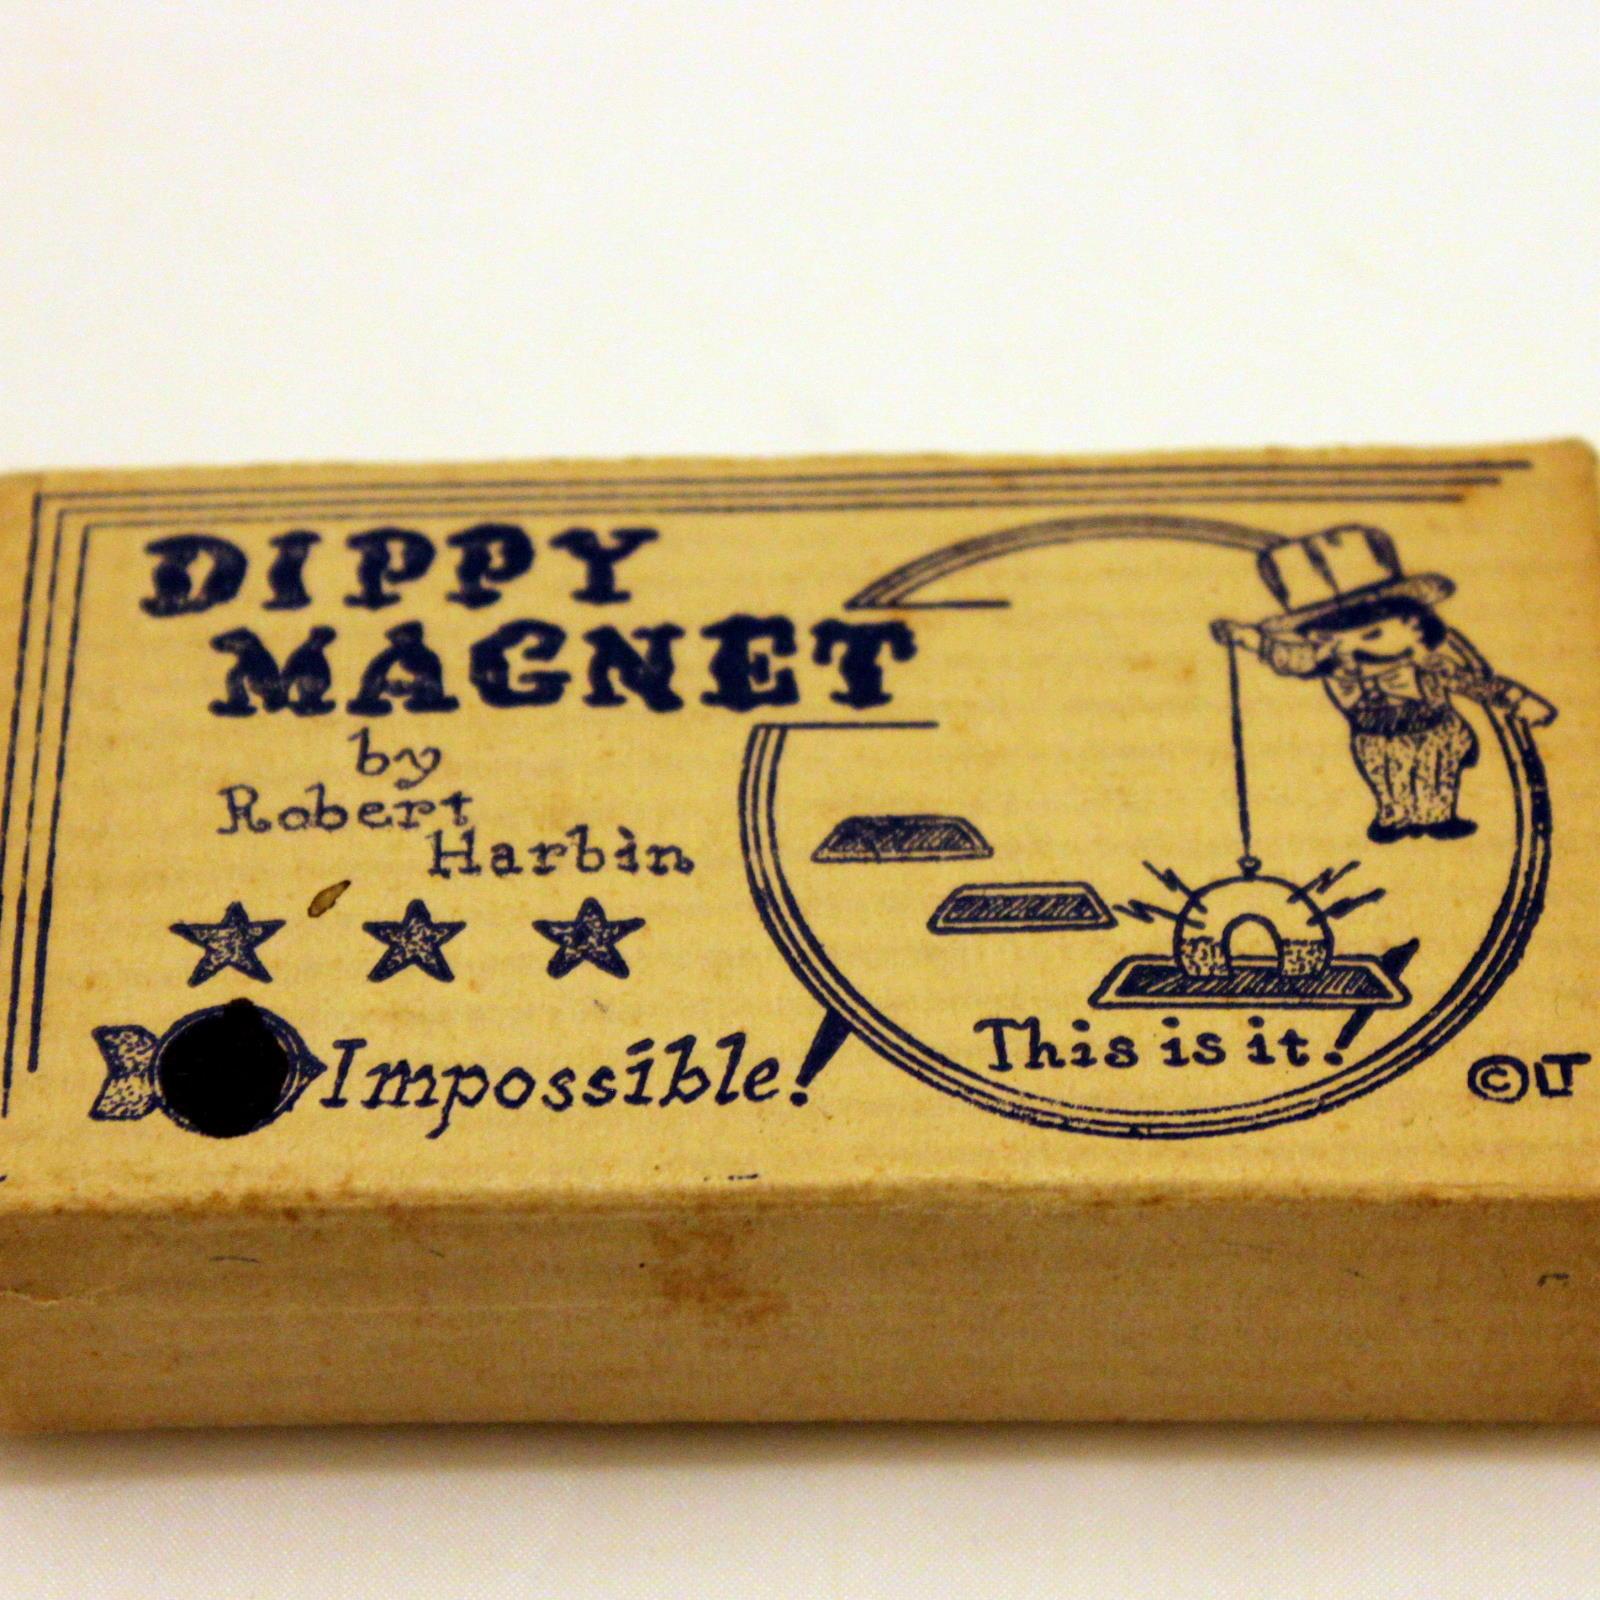 Robert Harbin's Dippy Magnets by Robert Harbin